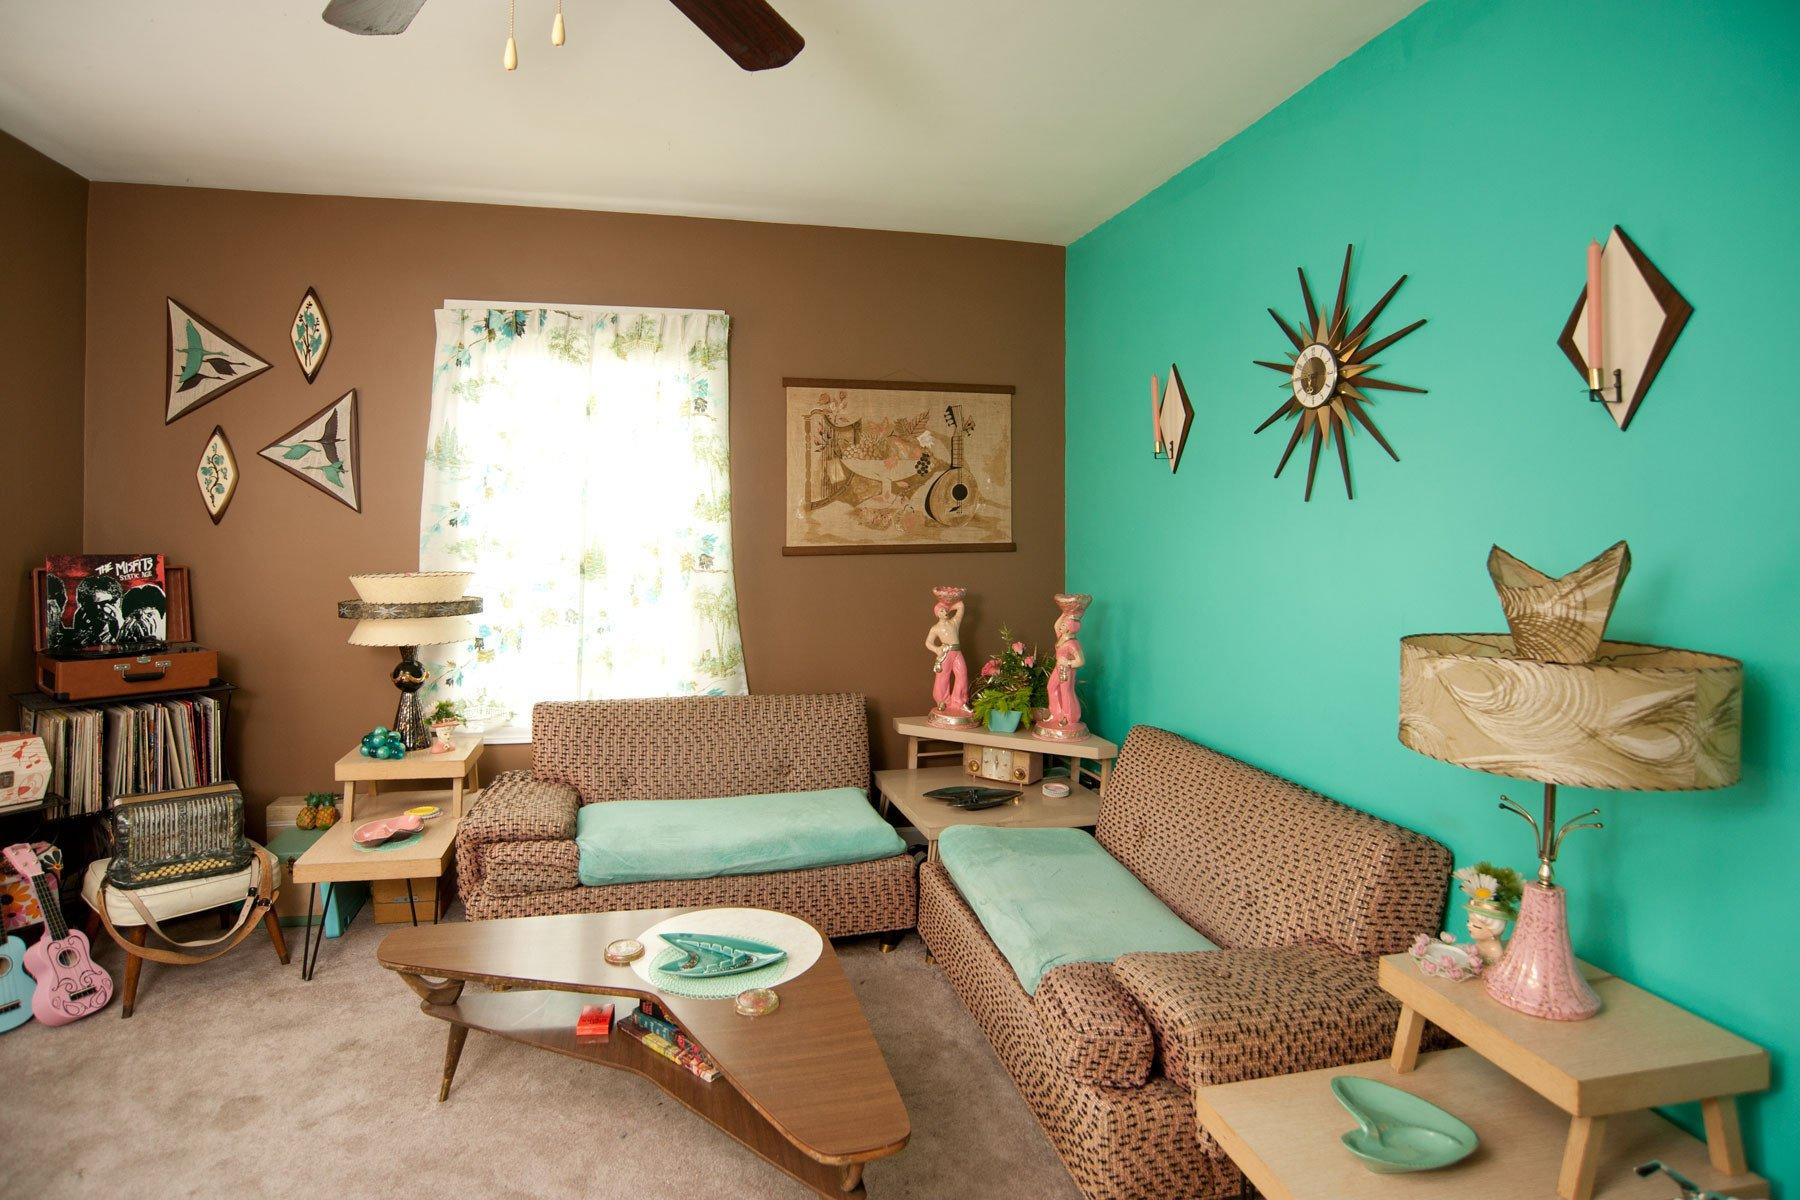 Mid Century Living Room Decor Mid Century Decor with Mandy Ness